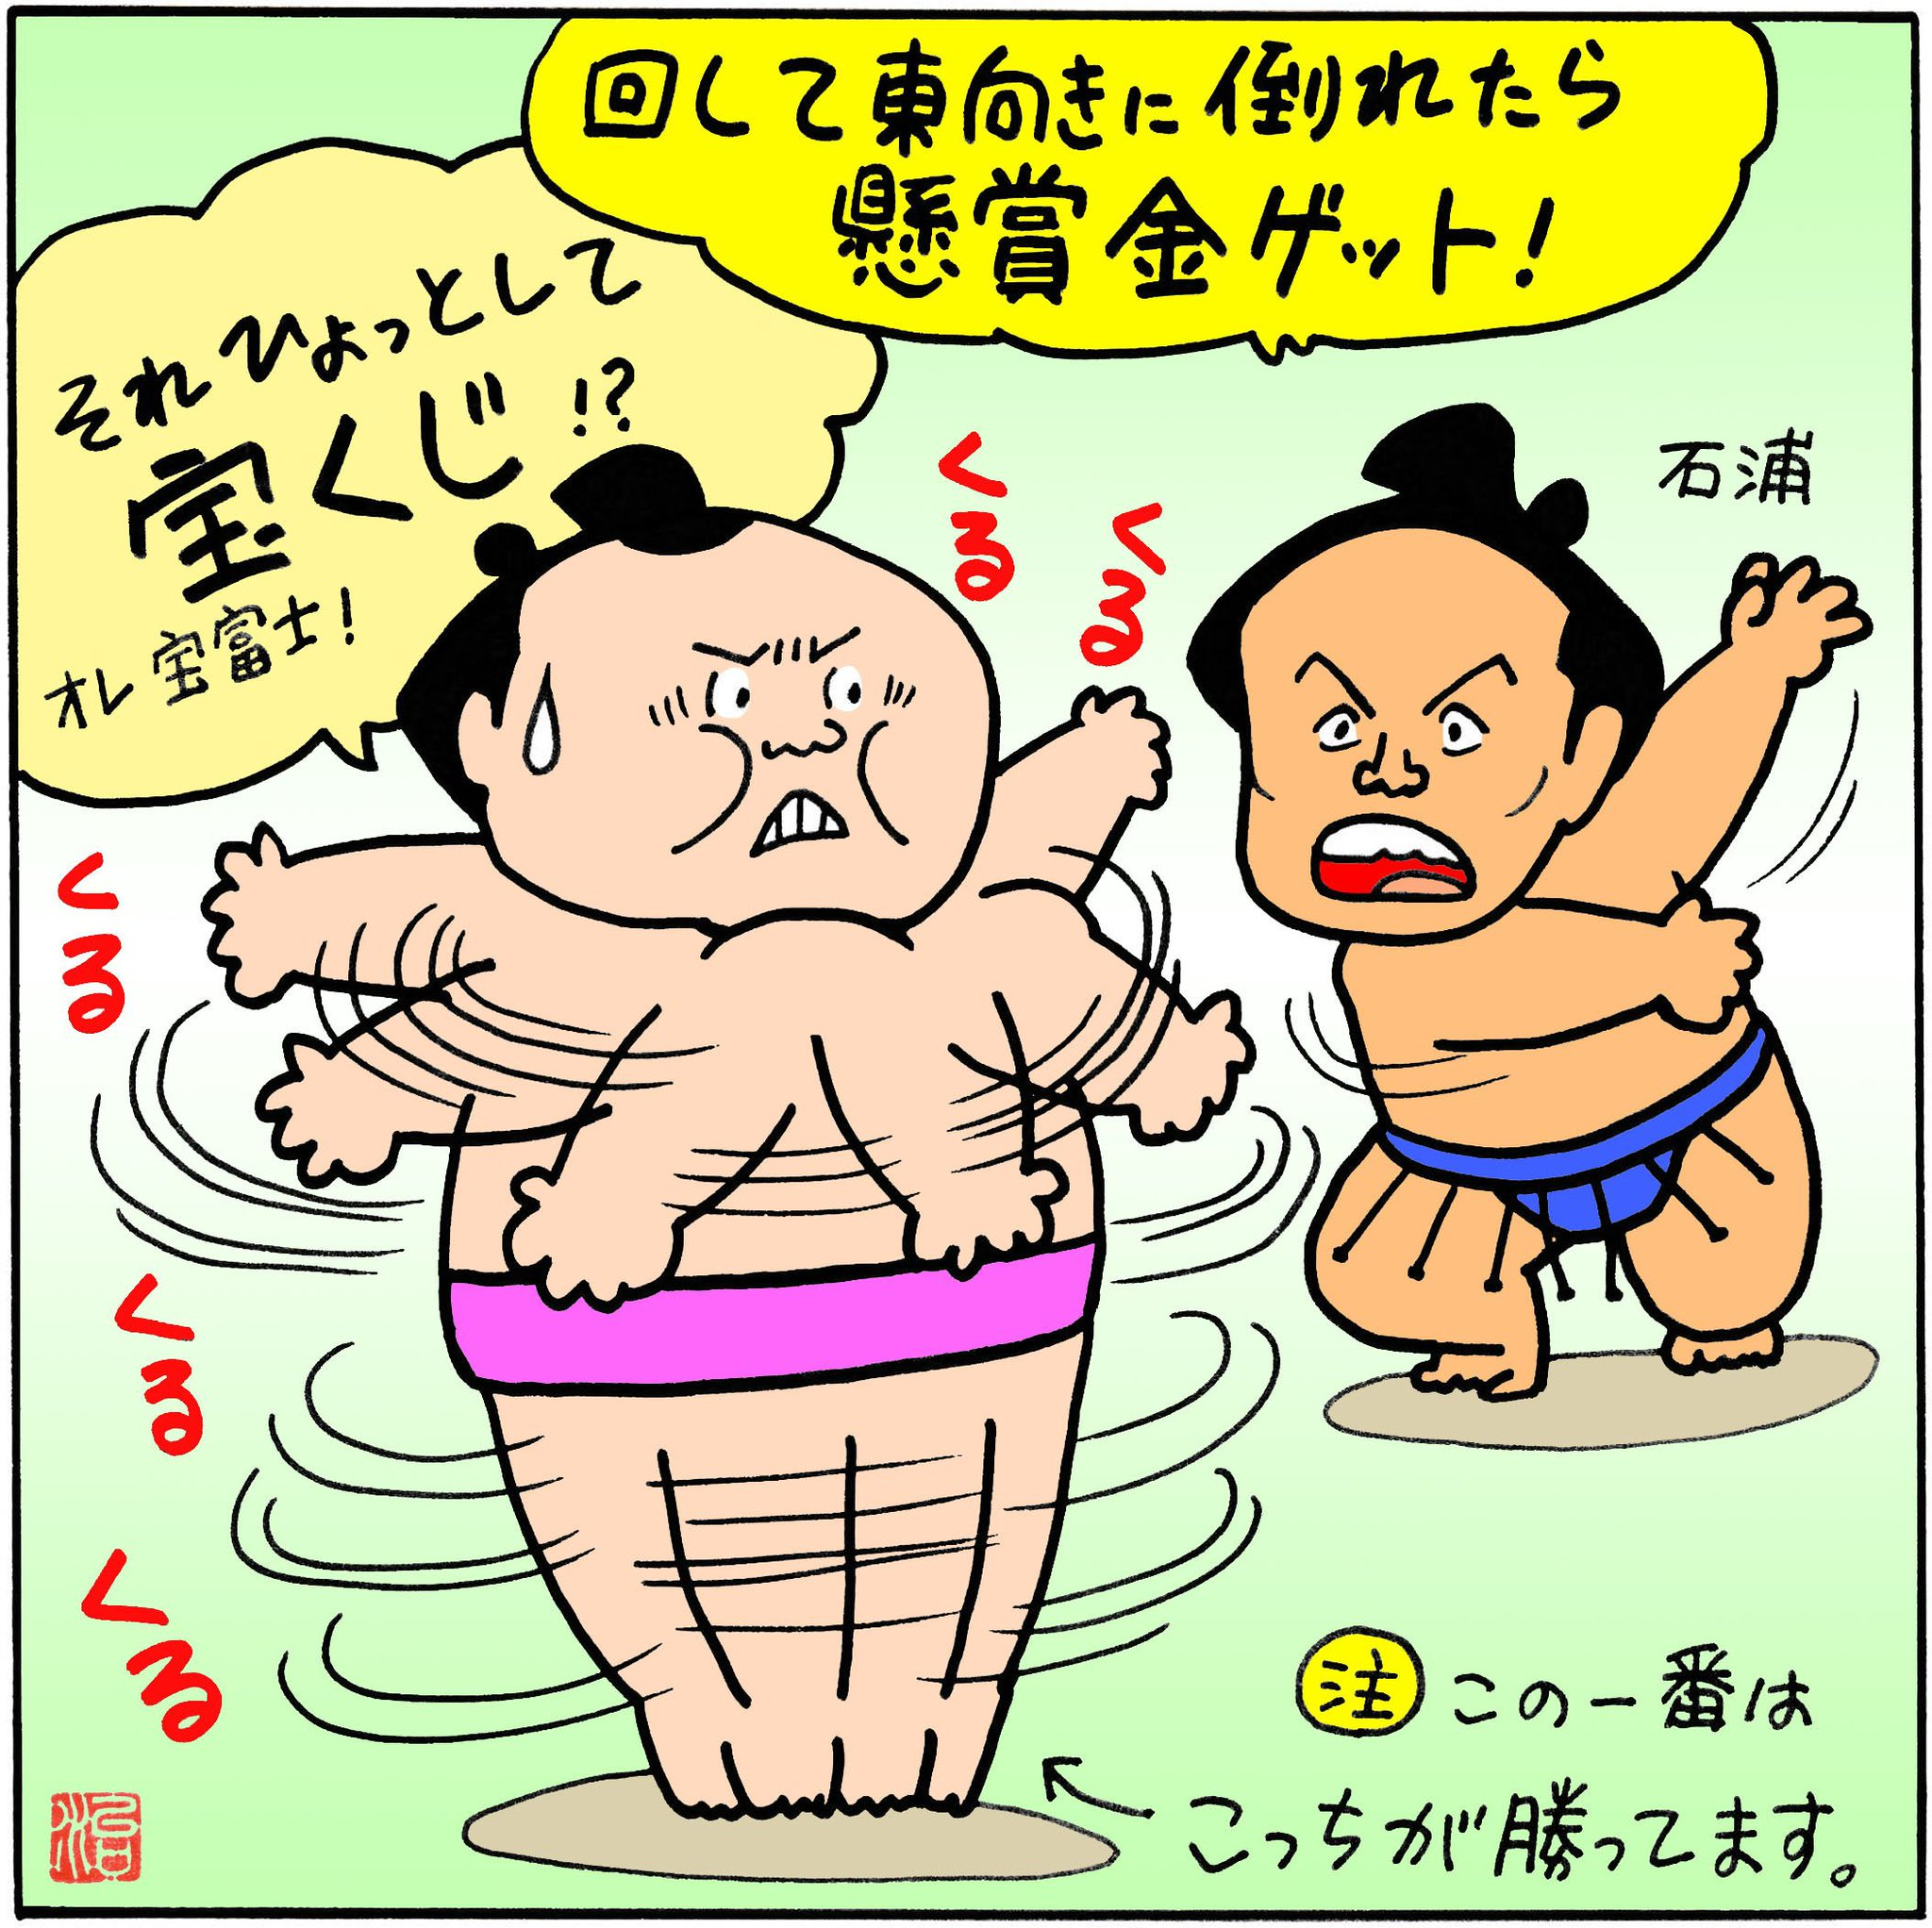 DKIZaFOUMAA_8Zi.jpg:large